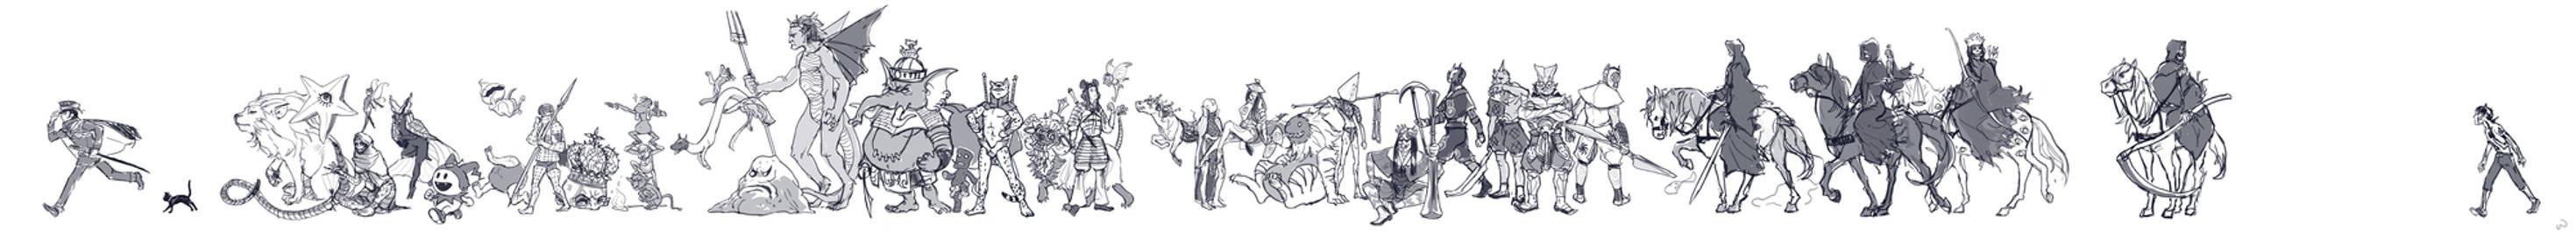 Megaten Demon Parade